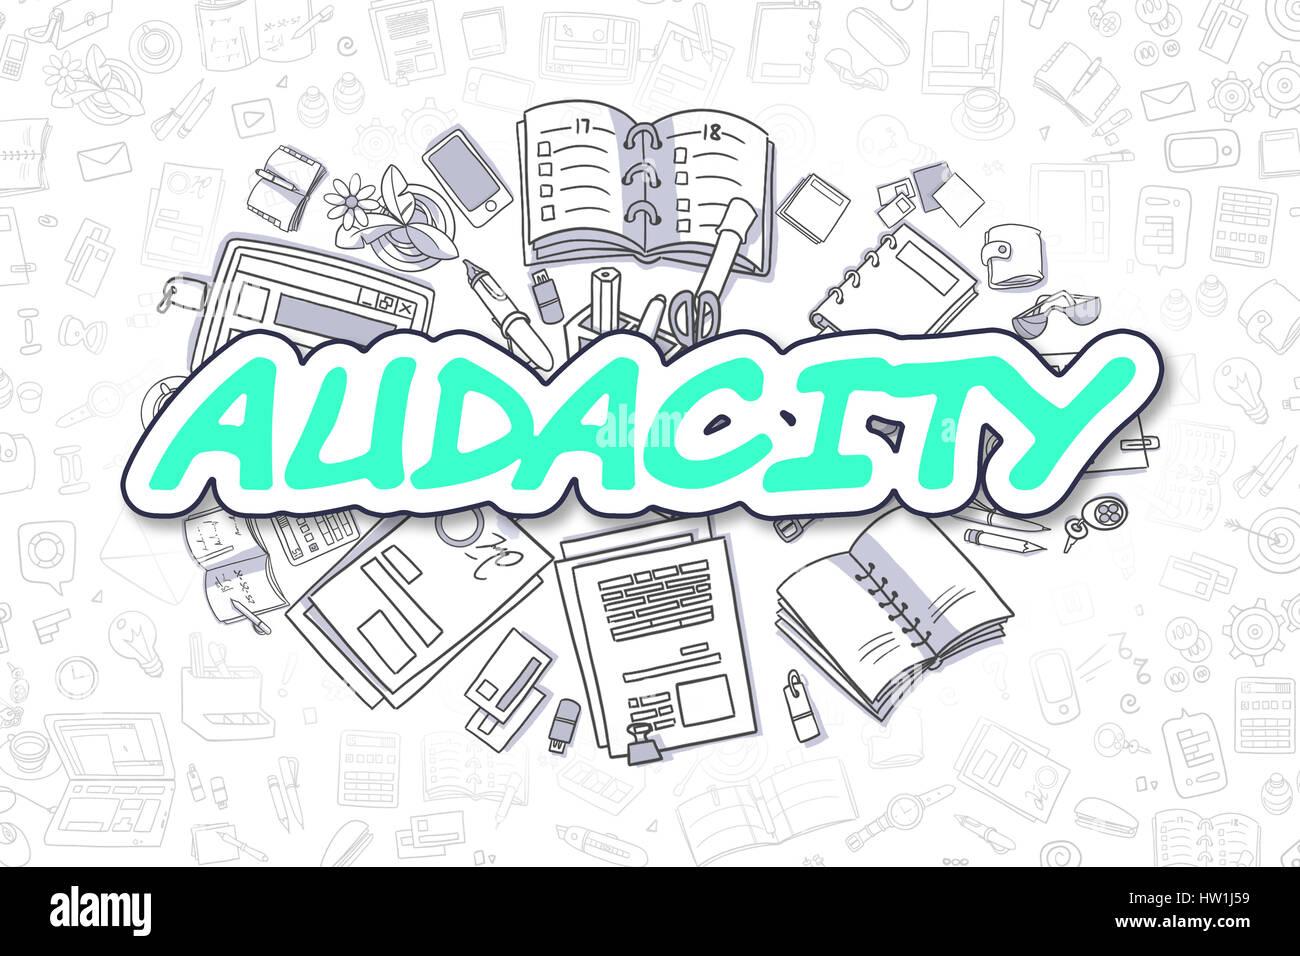 Audacity - Doodle Green Text. Business Concept. Stock Photo